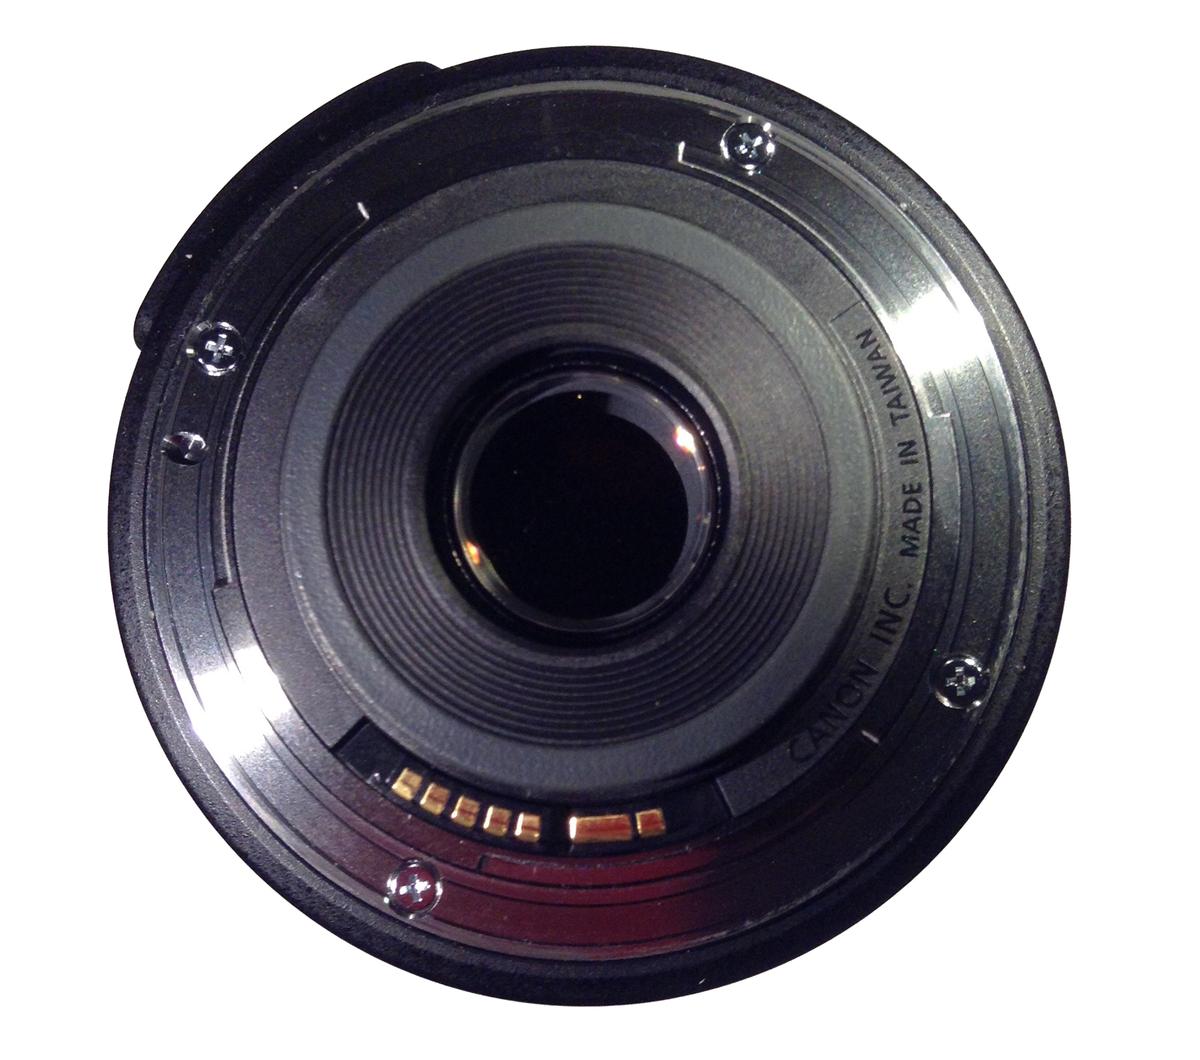 Lente Canon Ef S 18 135mm Wikipedia La Enciclopedia Libre